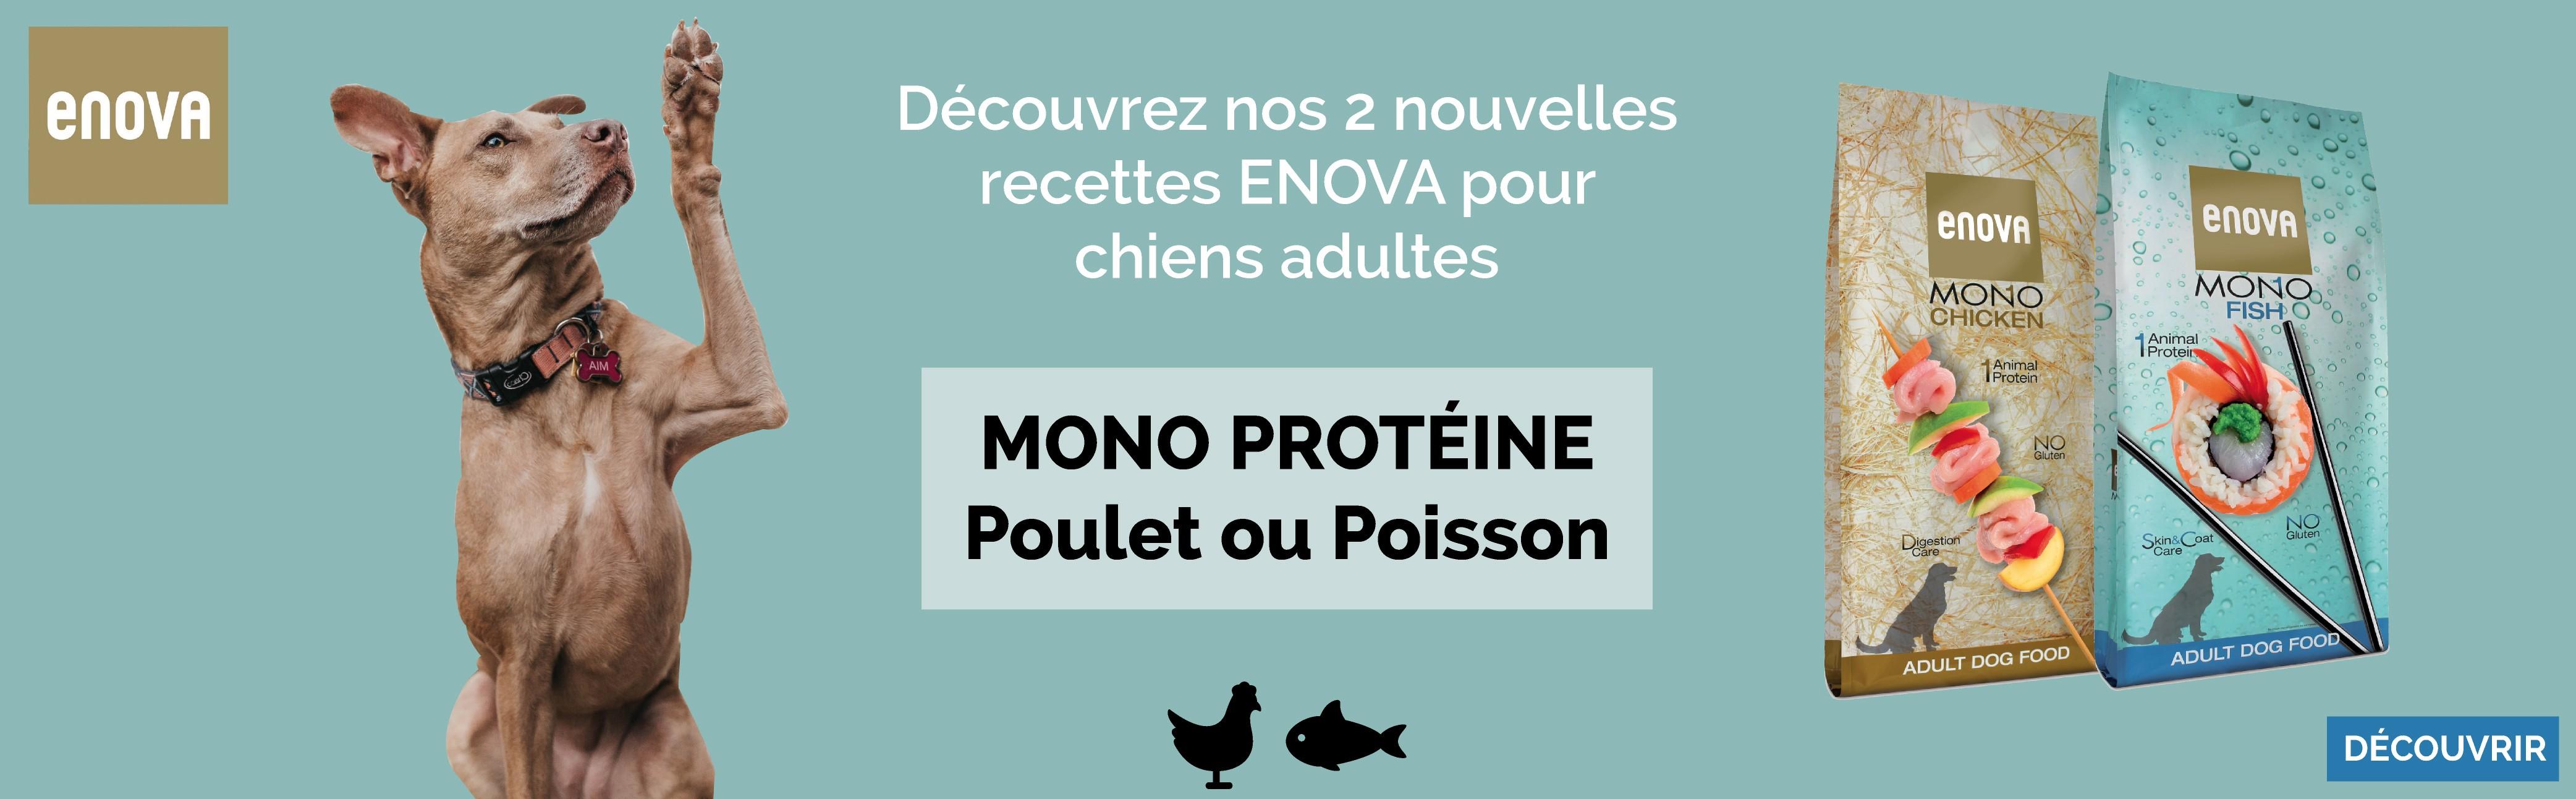 Croquettes ENOVA chiens - Mono protéine